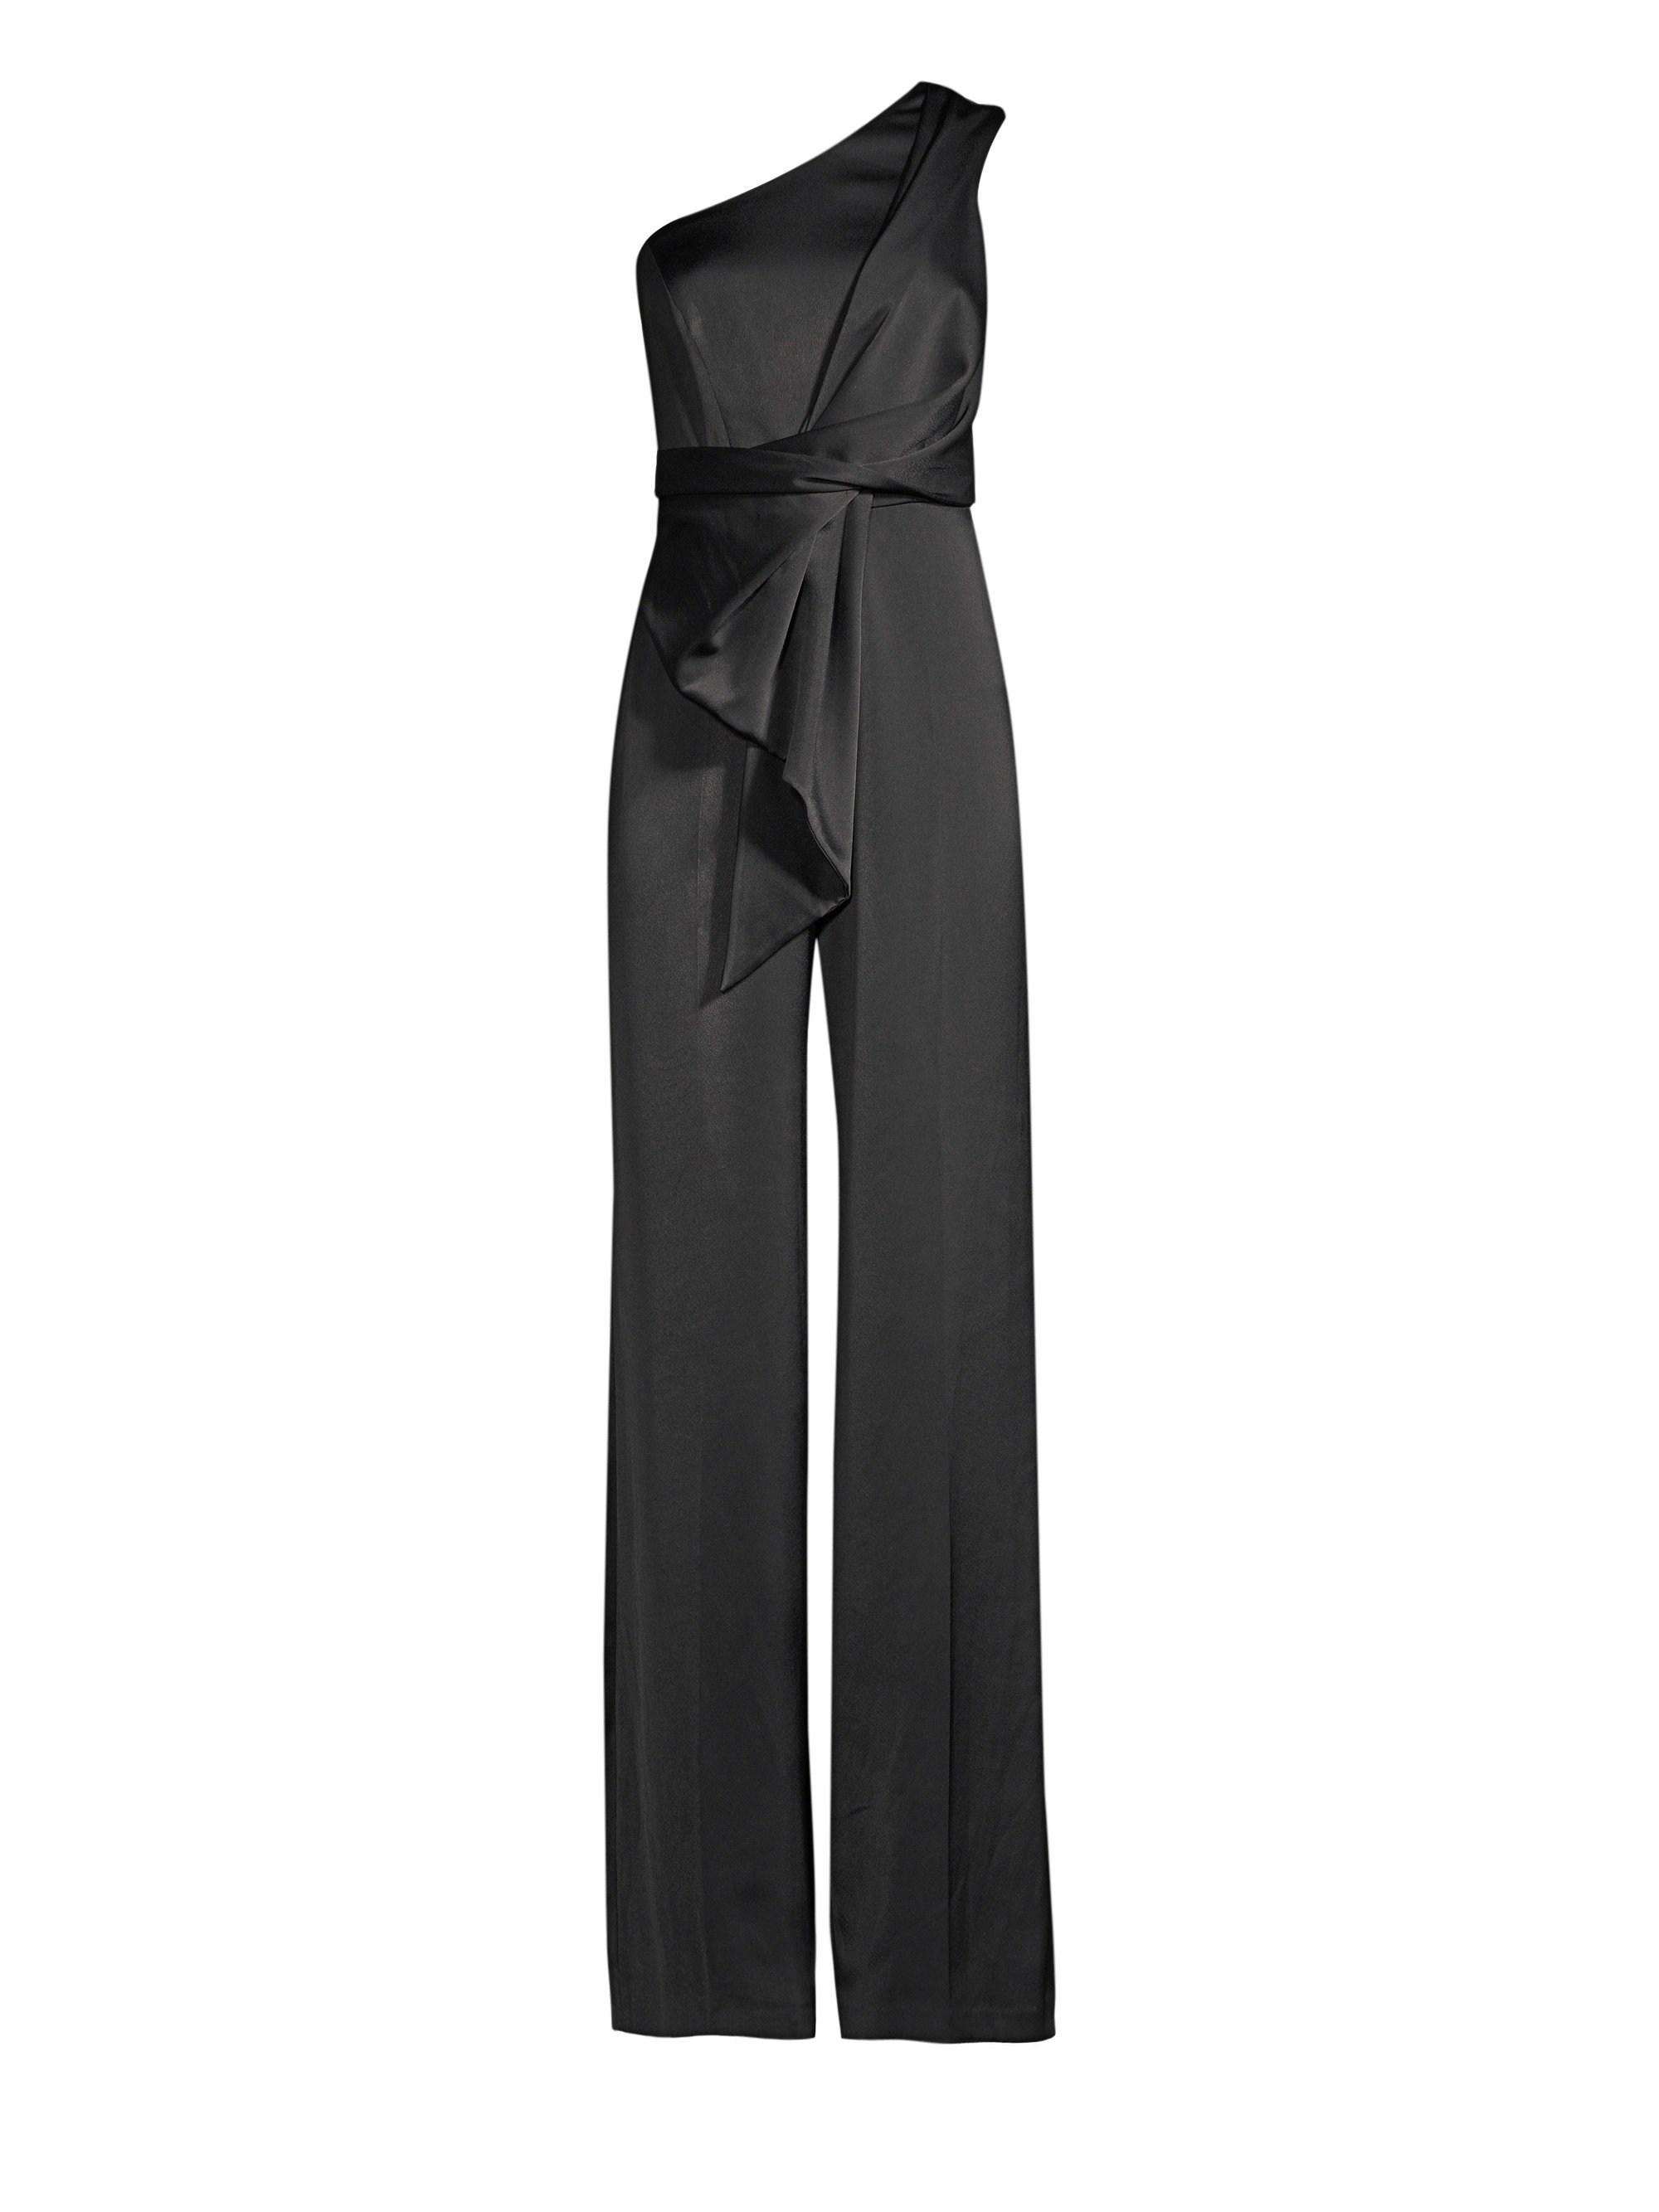 d891b849b7a7 Lyst - Jay Godfrey Cora One-shoulder Jumpsuit in Black